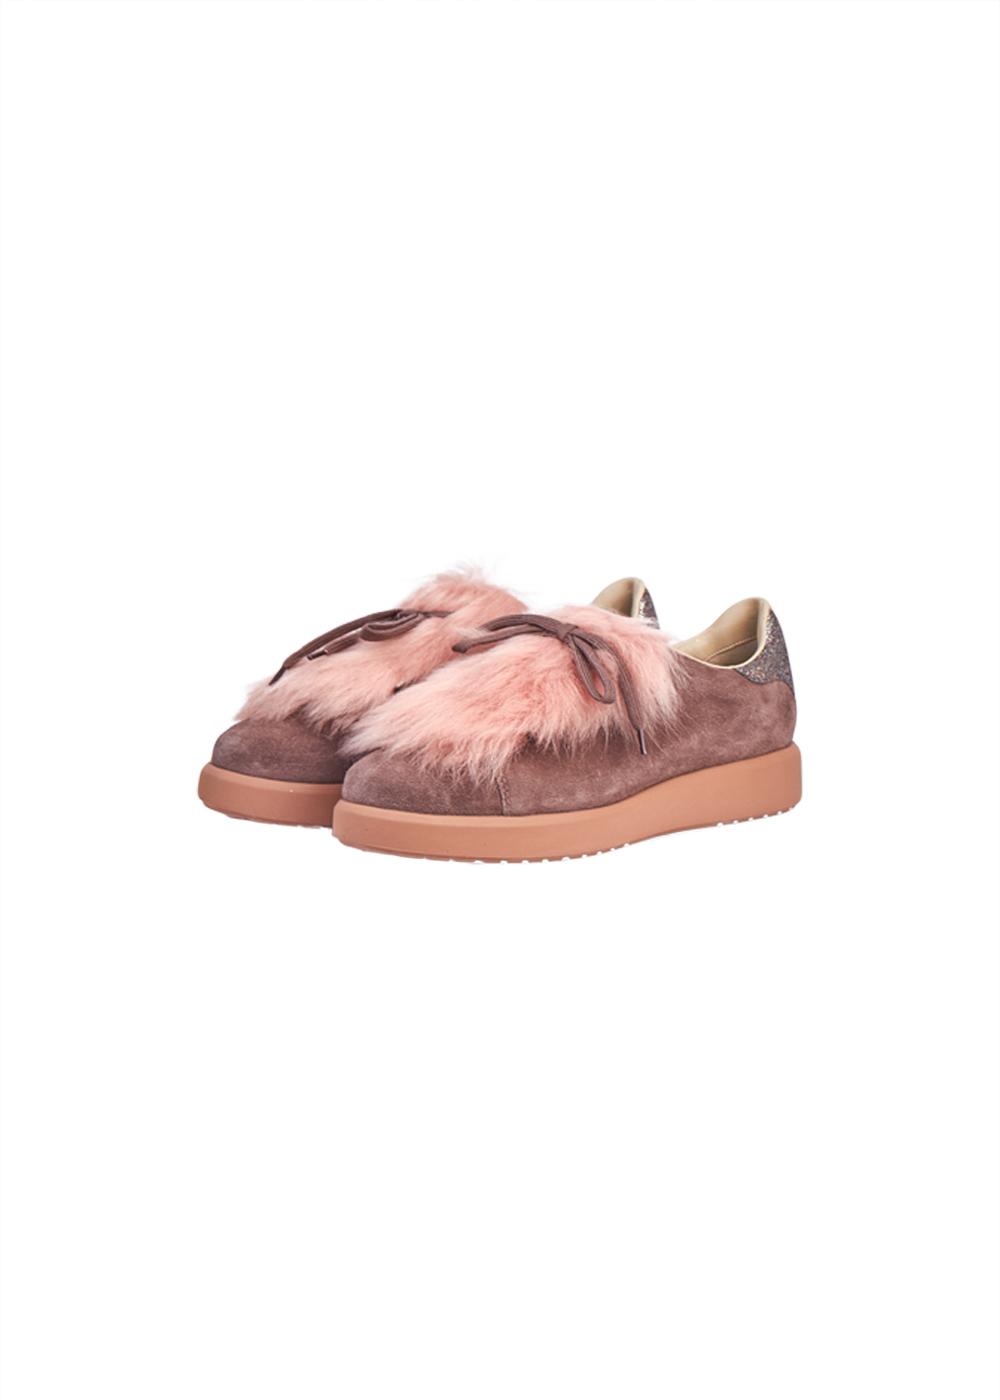 Купить Alberto Gozzi ботинки